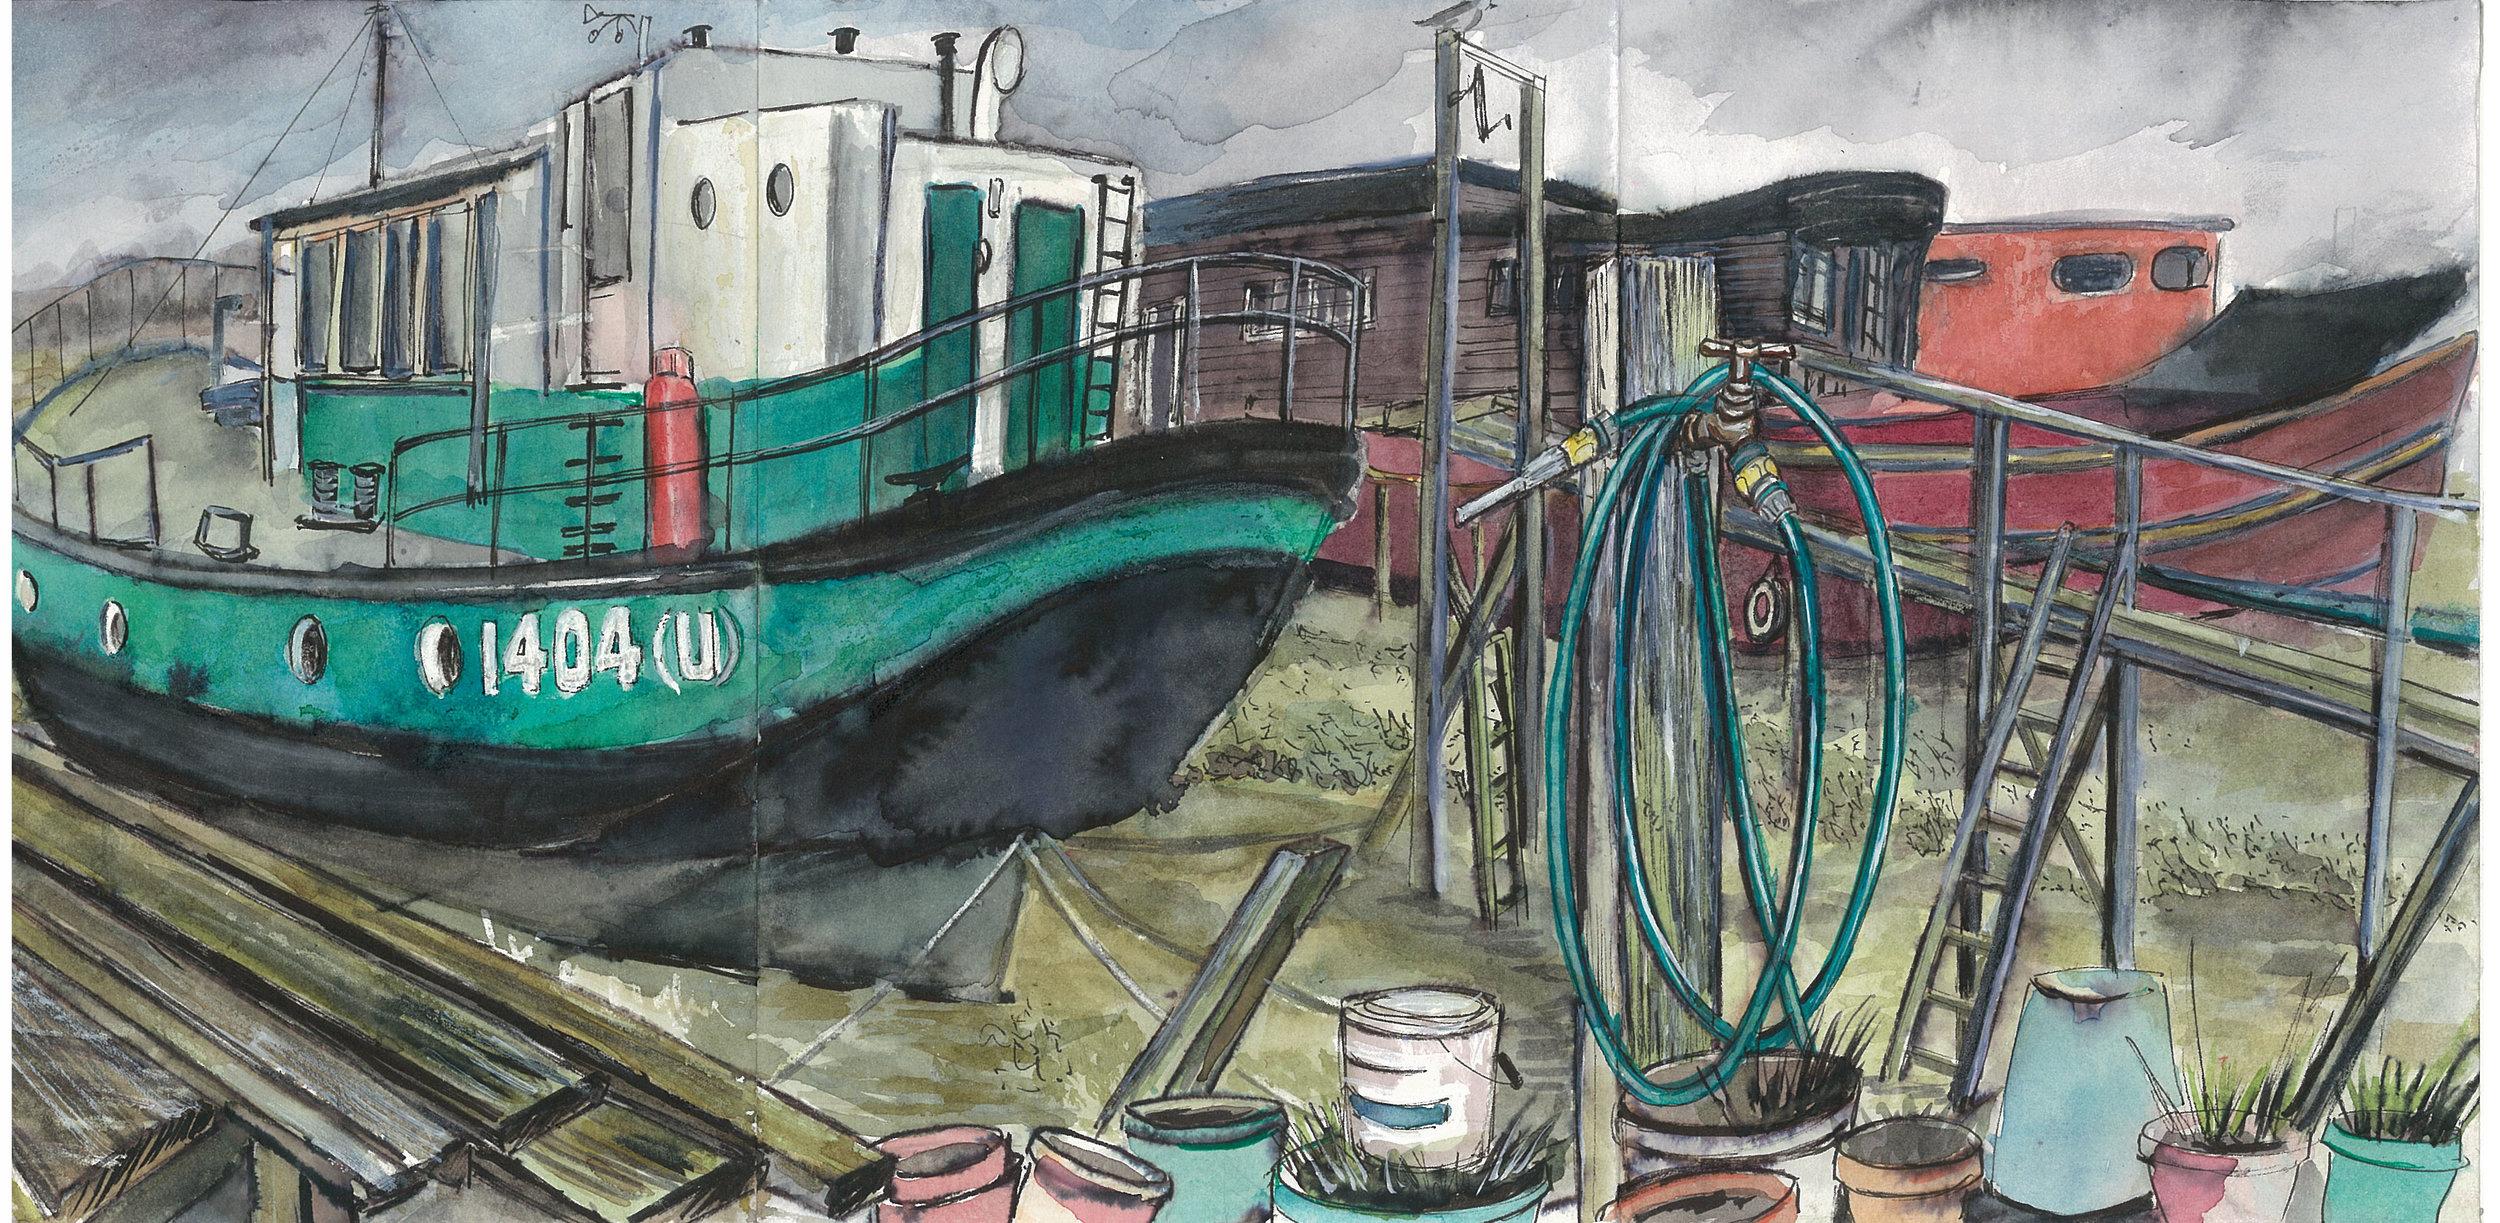 Green Boat & Hosepipe v2.jpg